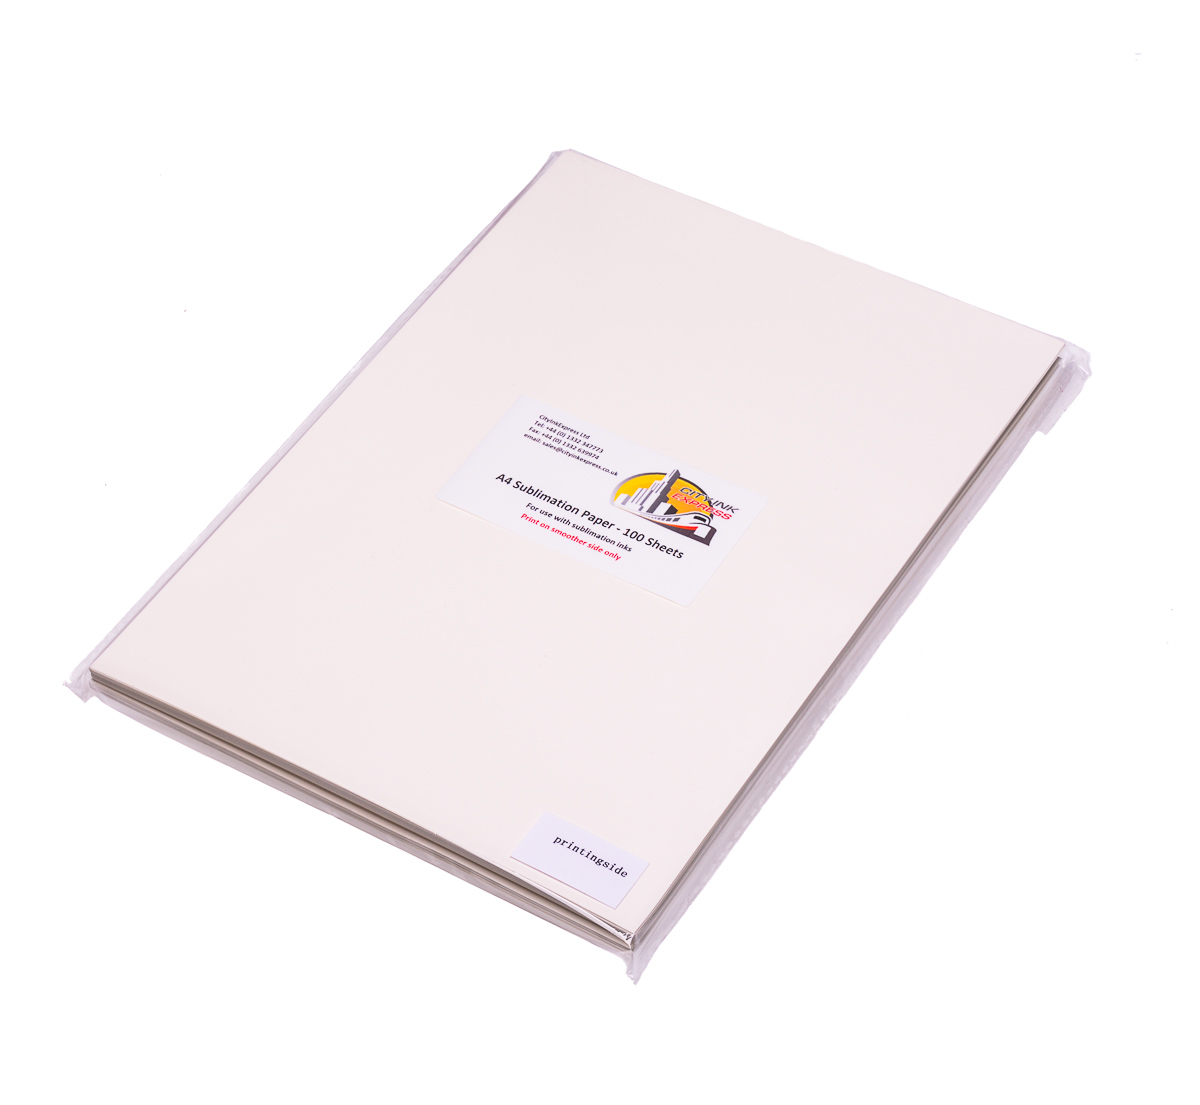 Dye Sublimation ink system - Fits Epson WF-7710DWF Printer